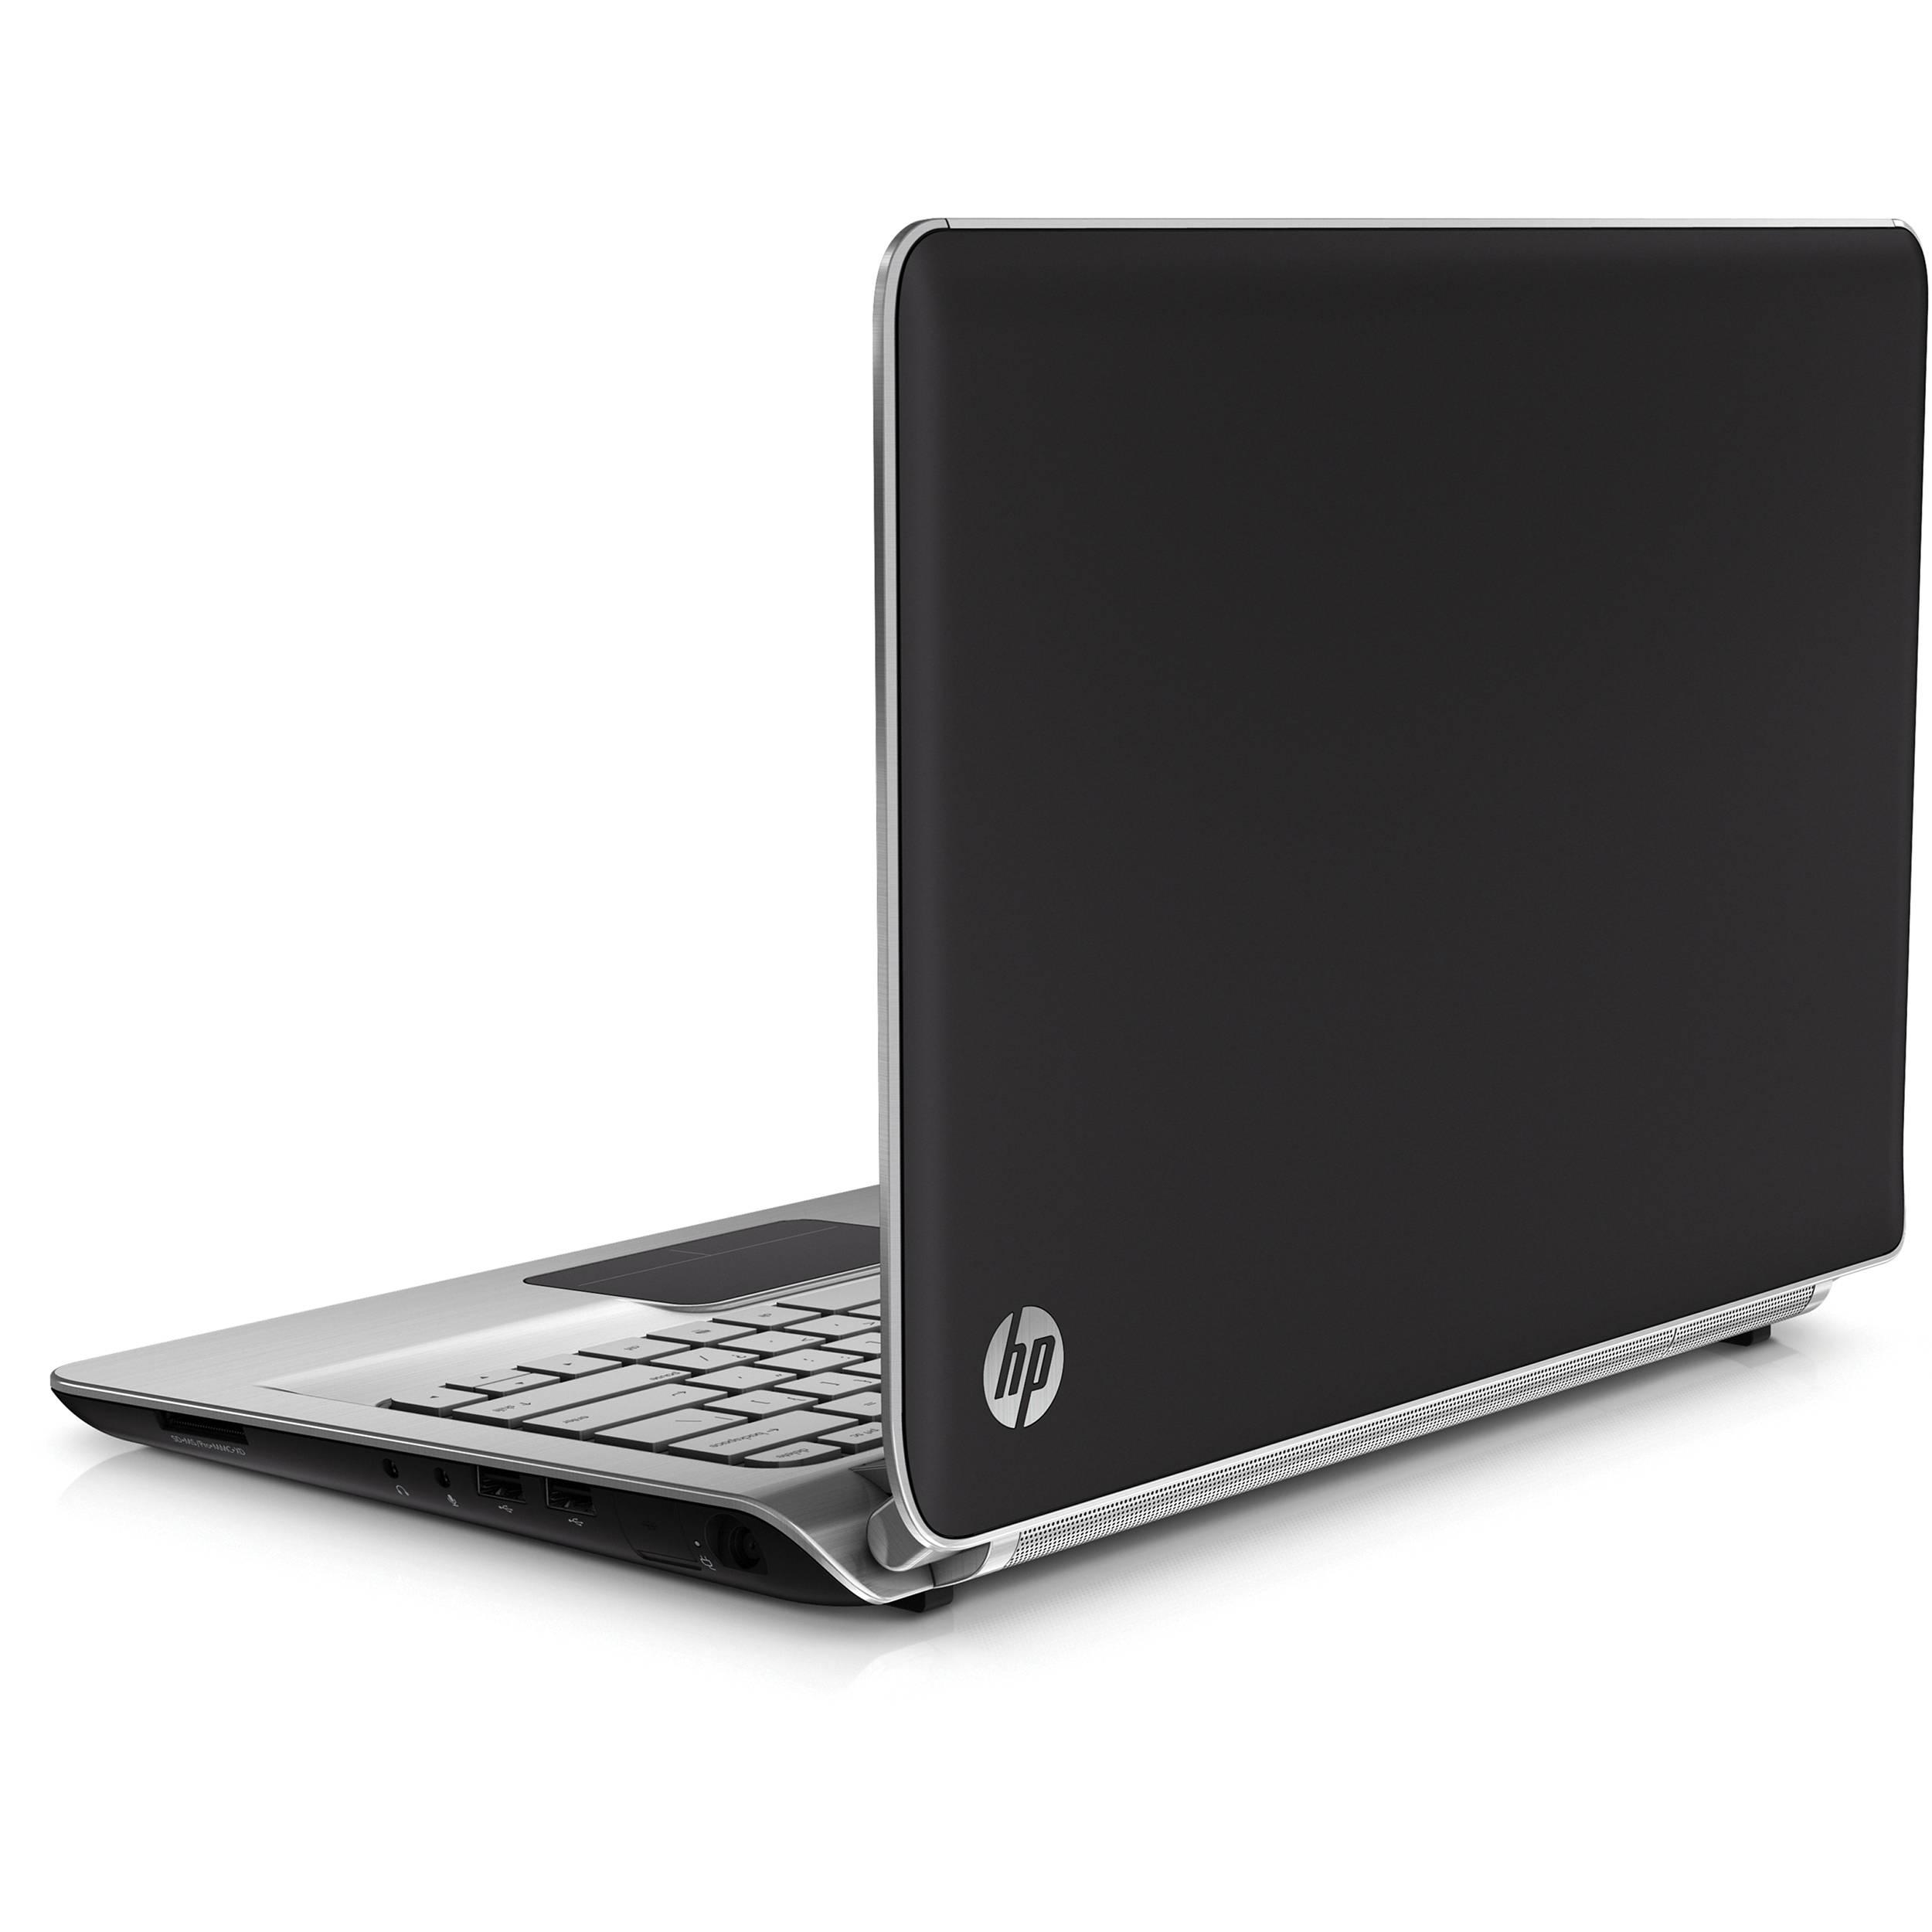 Hp Laptop Dimensions Hp Hewlett Packard Xyua Aba Pavilion Dm Us